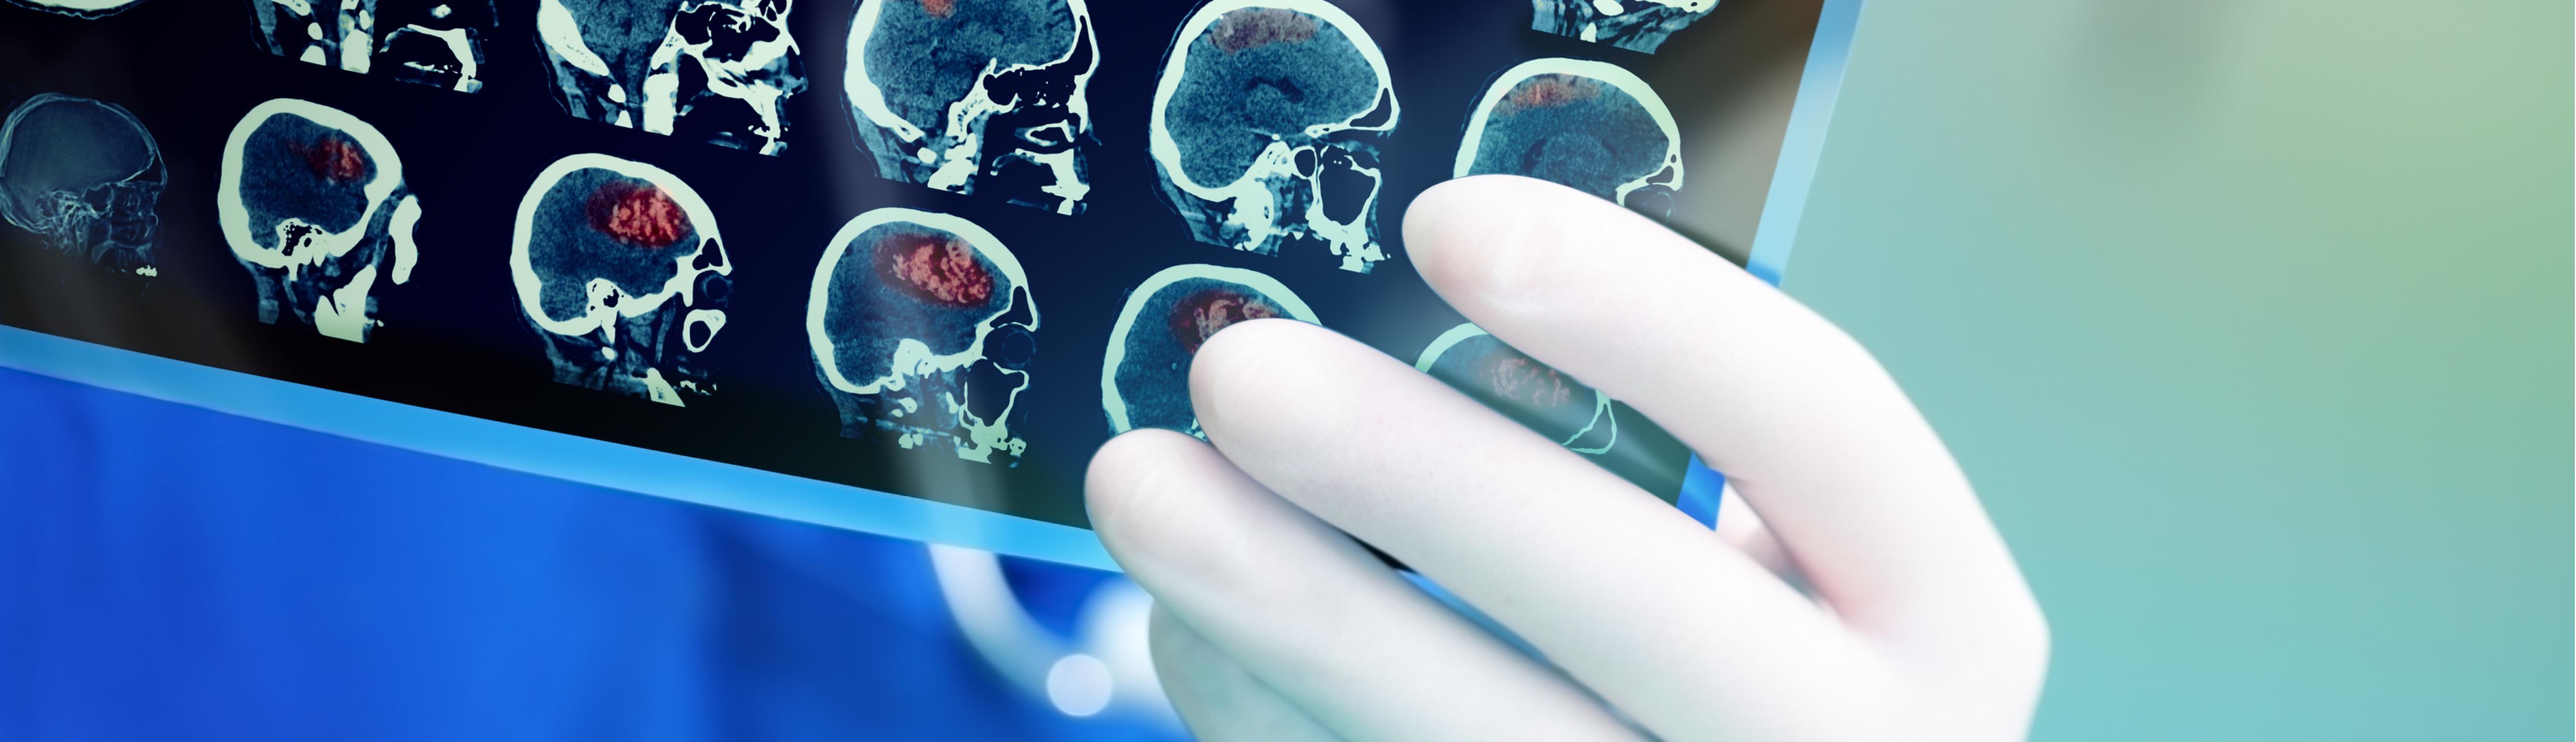 PET Scan Imaging at Pullman Regional Hospital